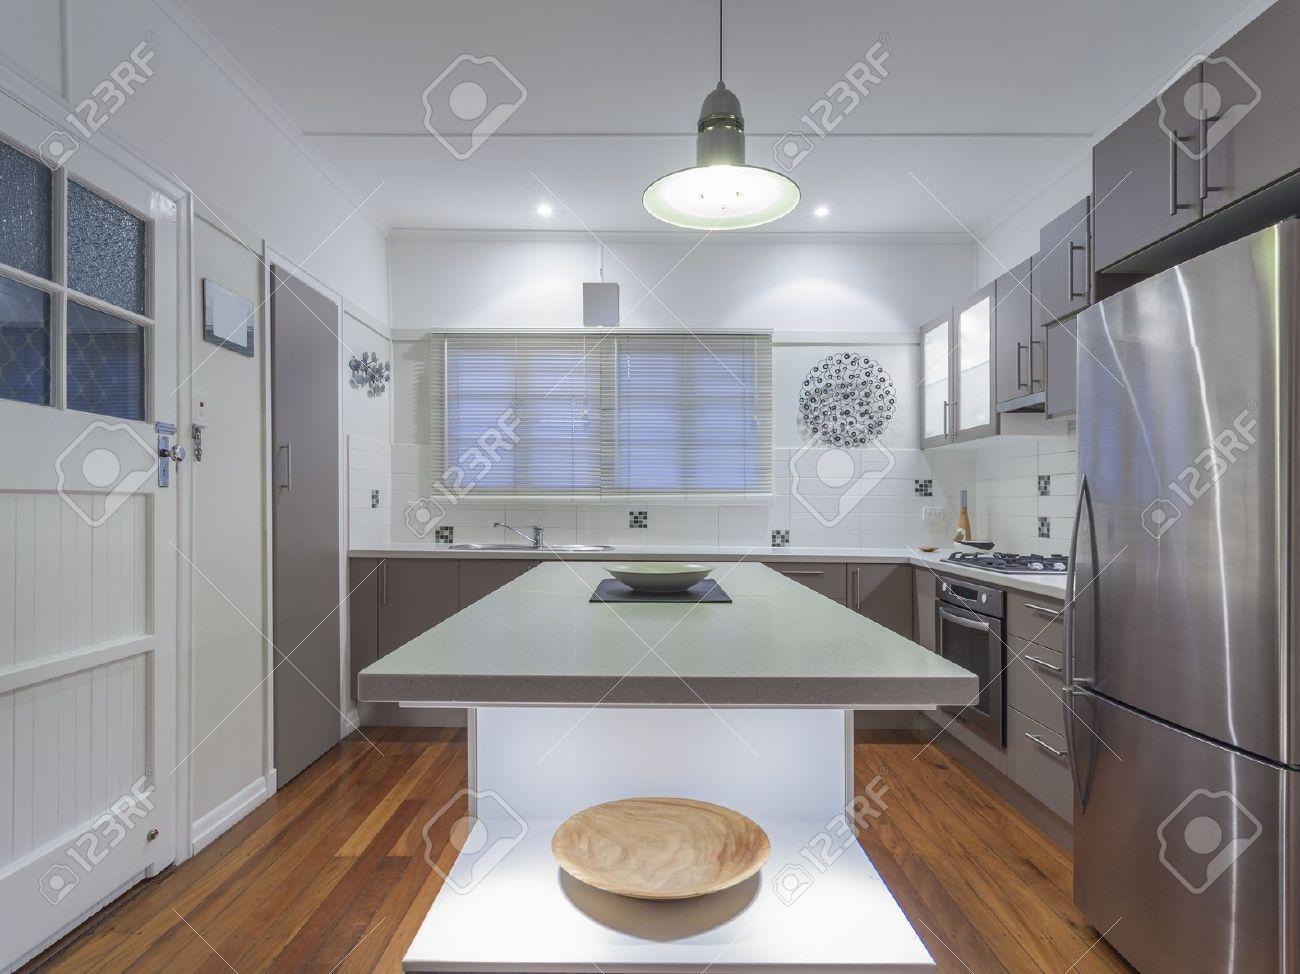 Small modern kitchen in Australian home Stock Photo - 19798580